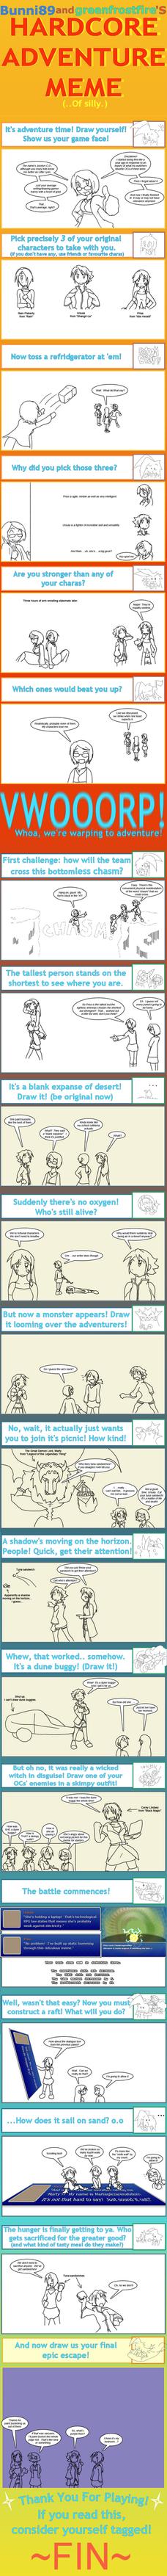 Very Late Hardcore Adventure Meme by JocelynSamara